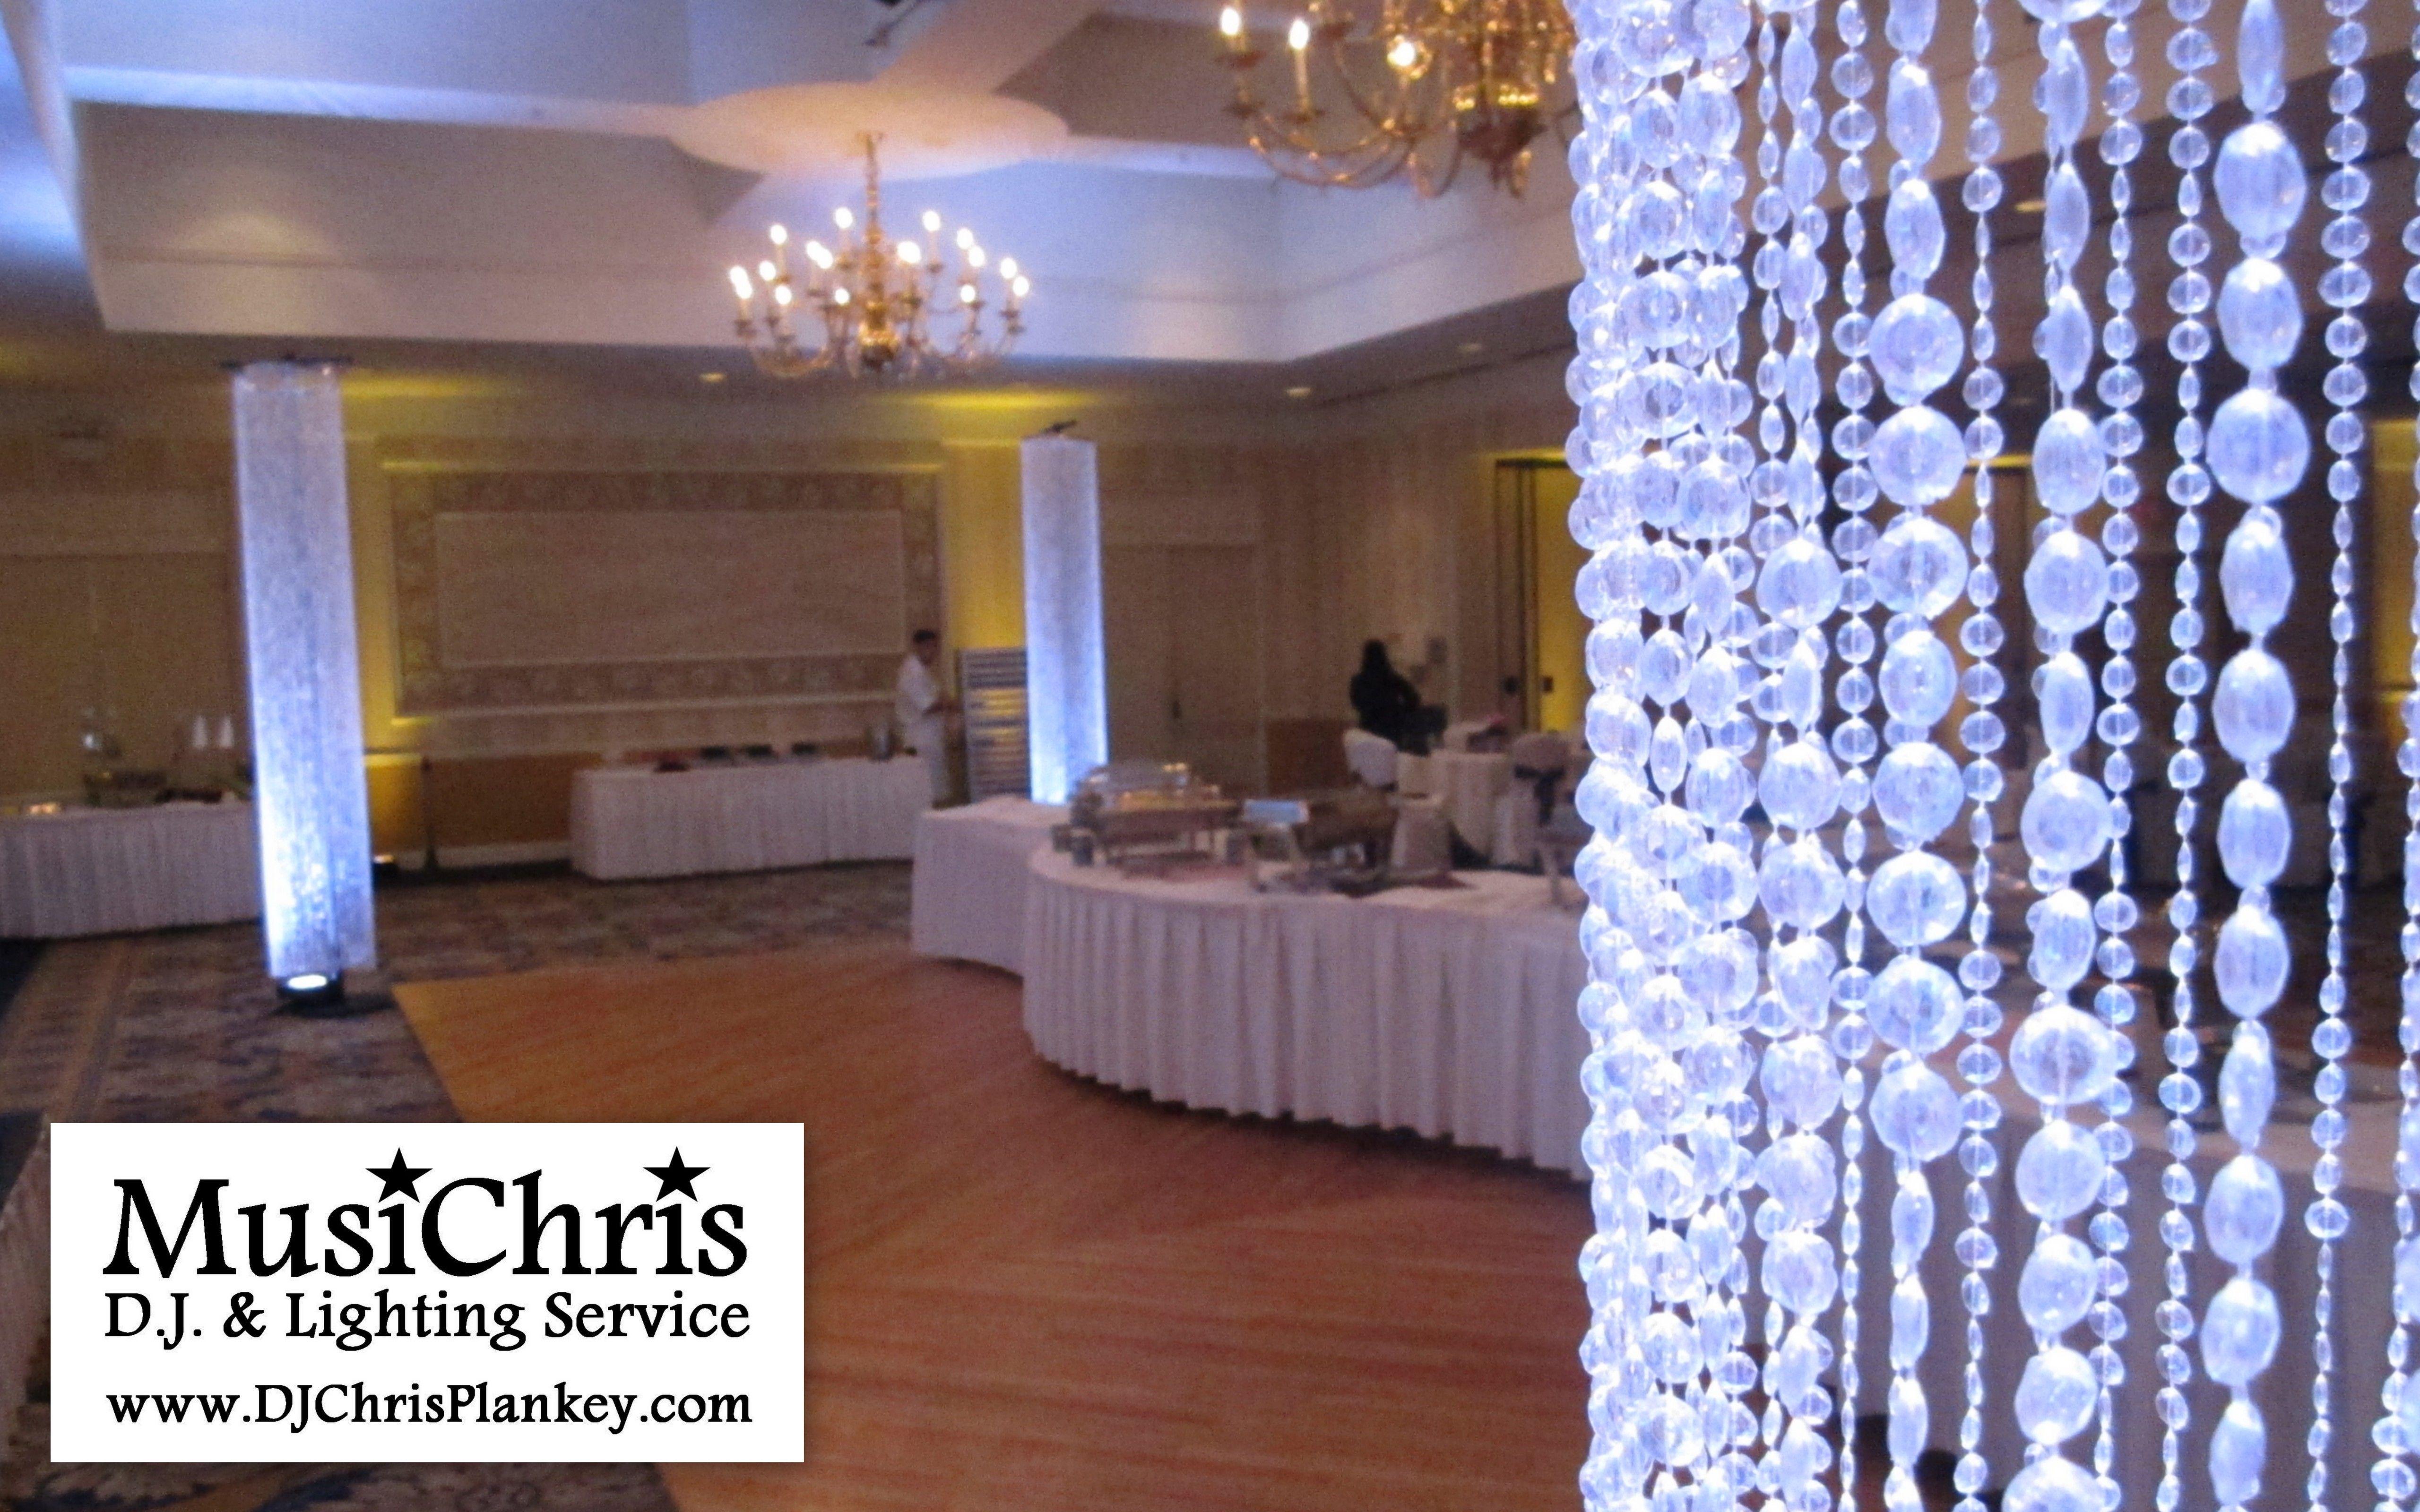 Crystal Columns Unique Wedding Reception Decor Bling Elegant Classy Ballroom Wedding Decor Elegant Winter Wedding Decorations Wedding Decorations